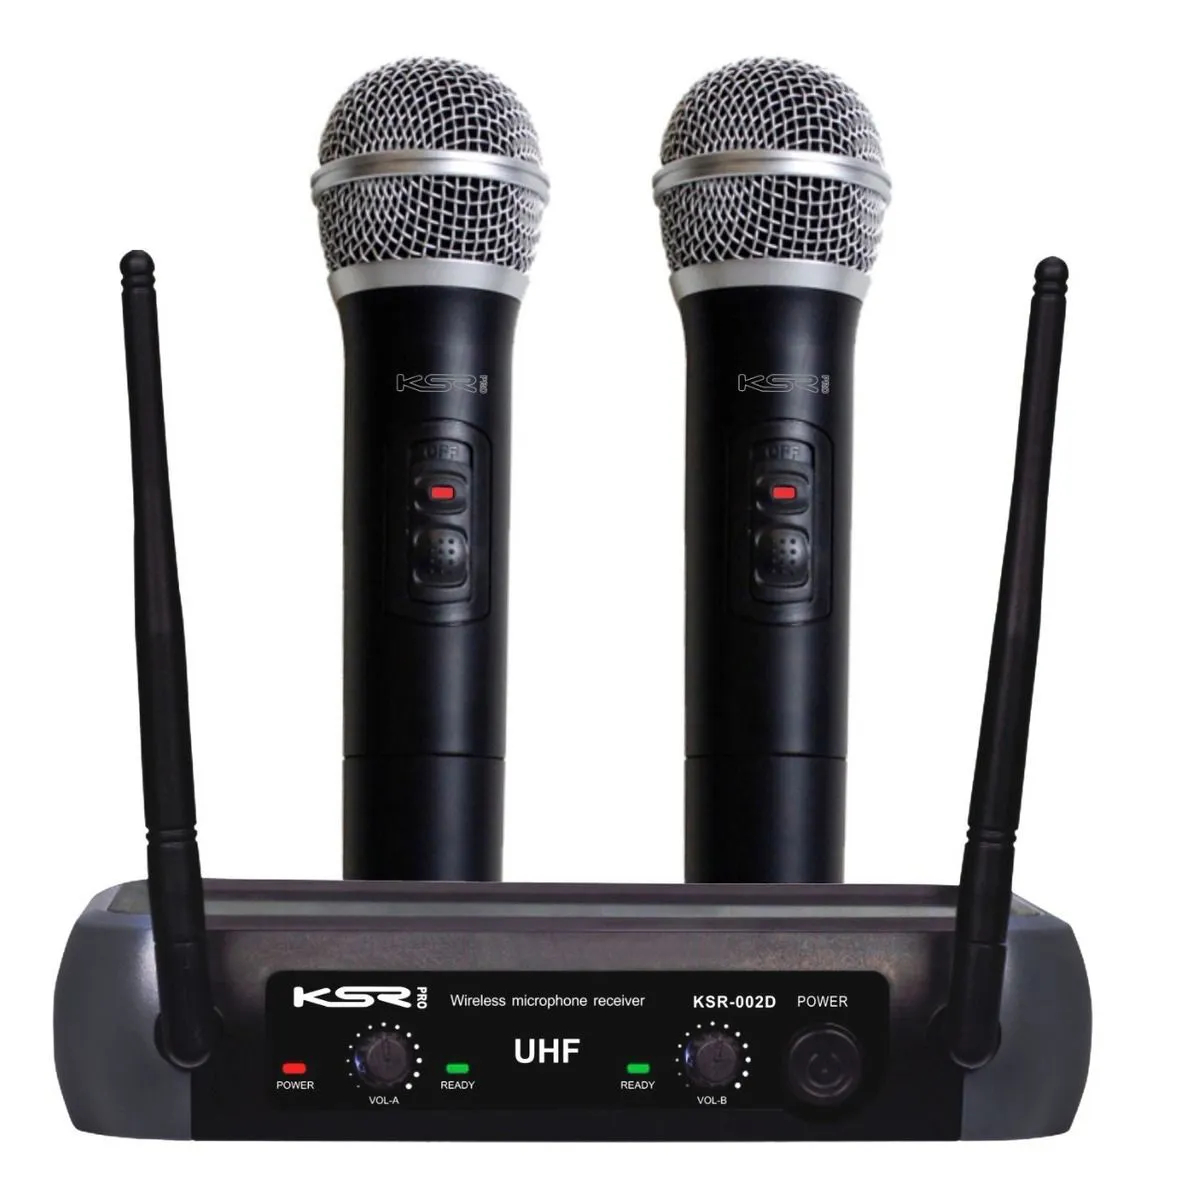 Microfone Sem Fio KSR Pro 002-D Duplo